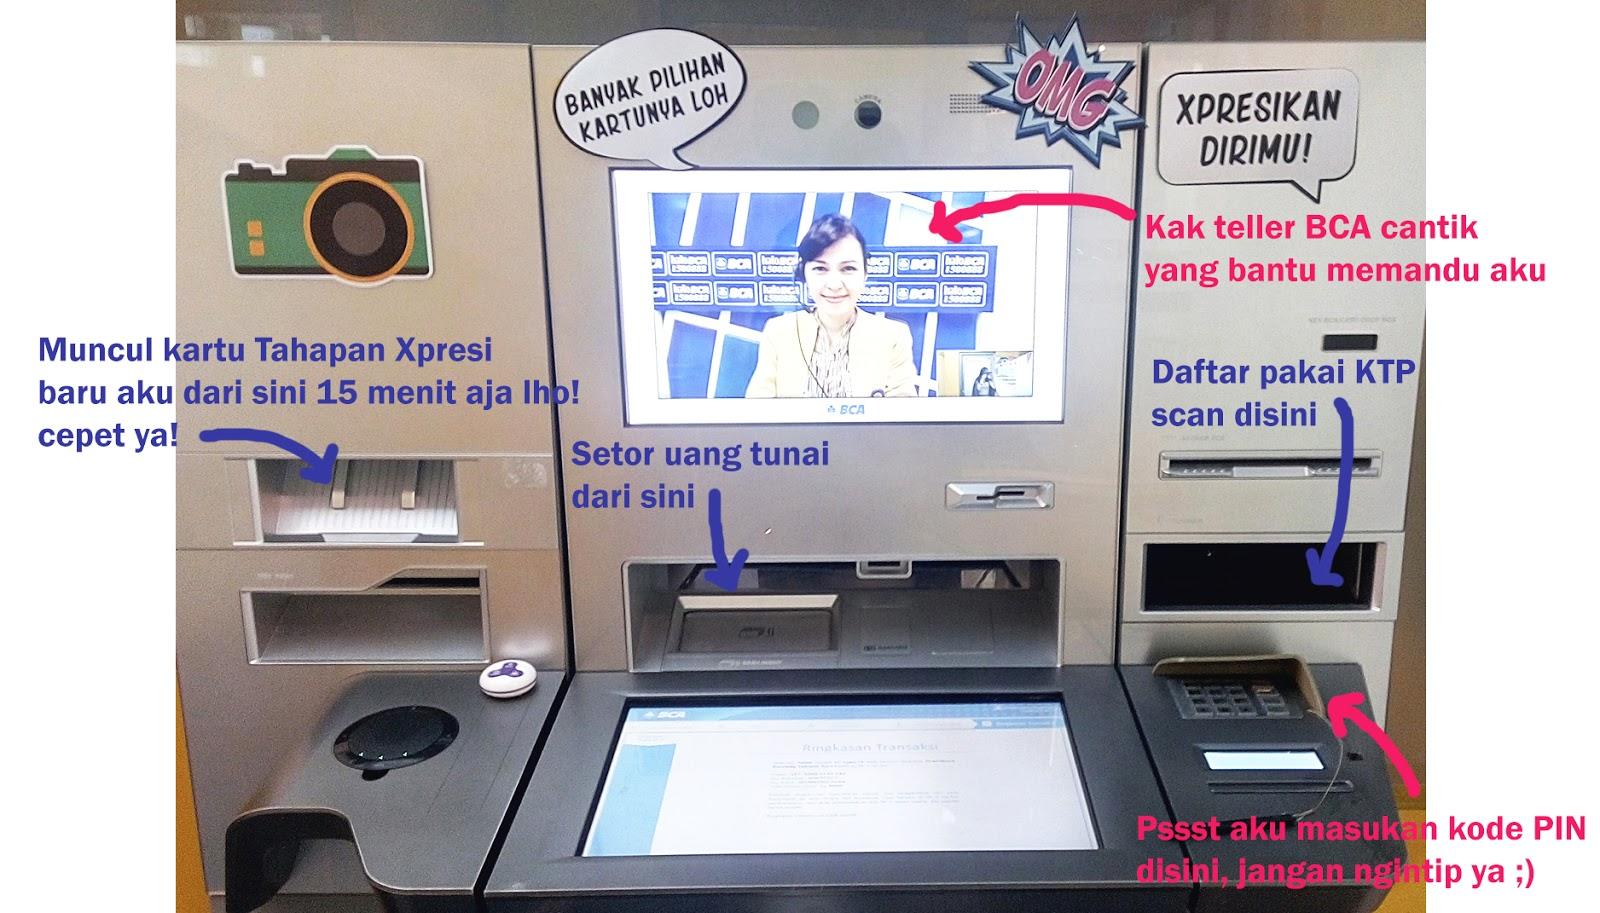 Deposito Perdagangan Kota Padang: Biner Pilihan Robot Ex4 Decompiler